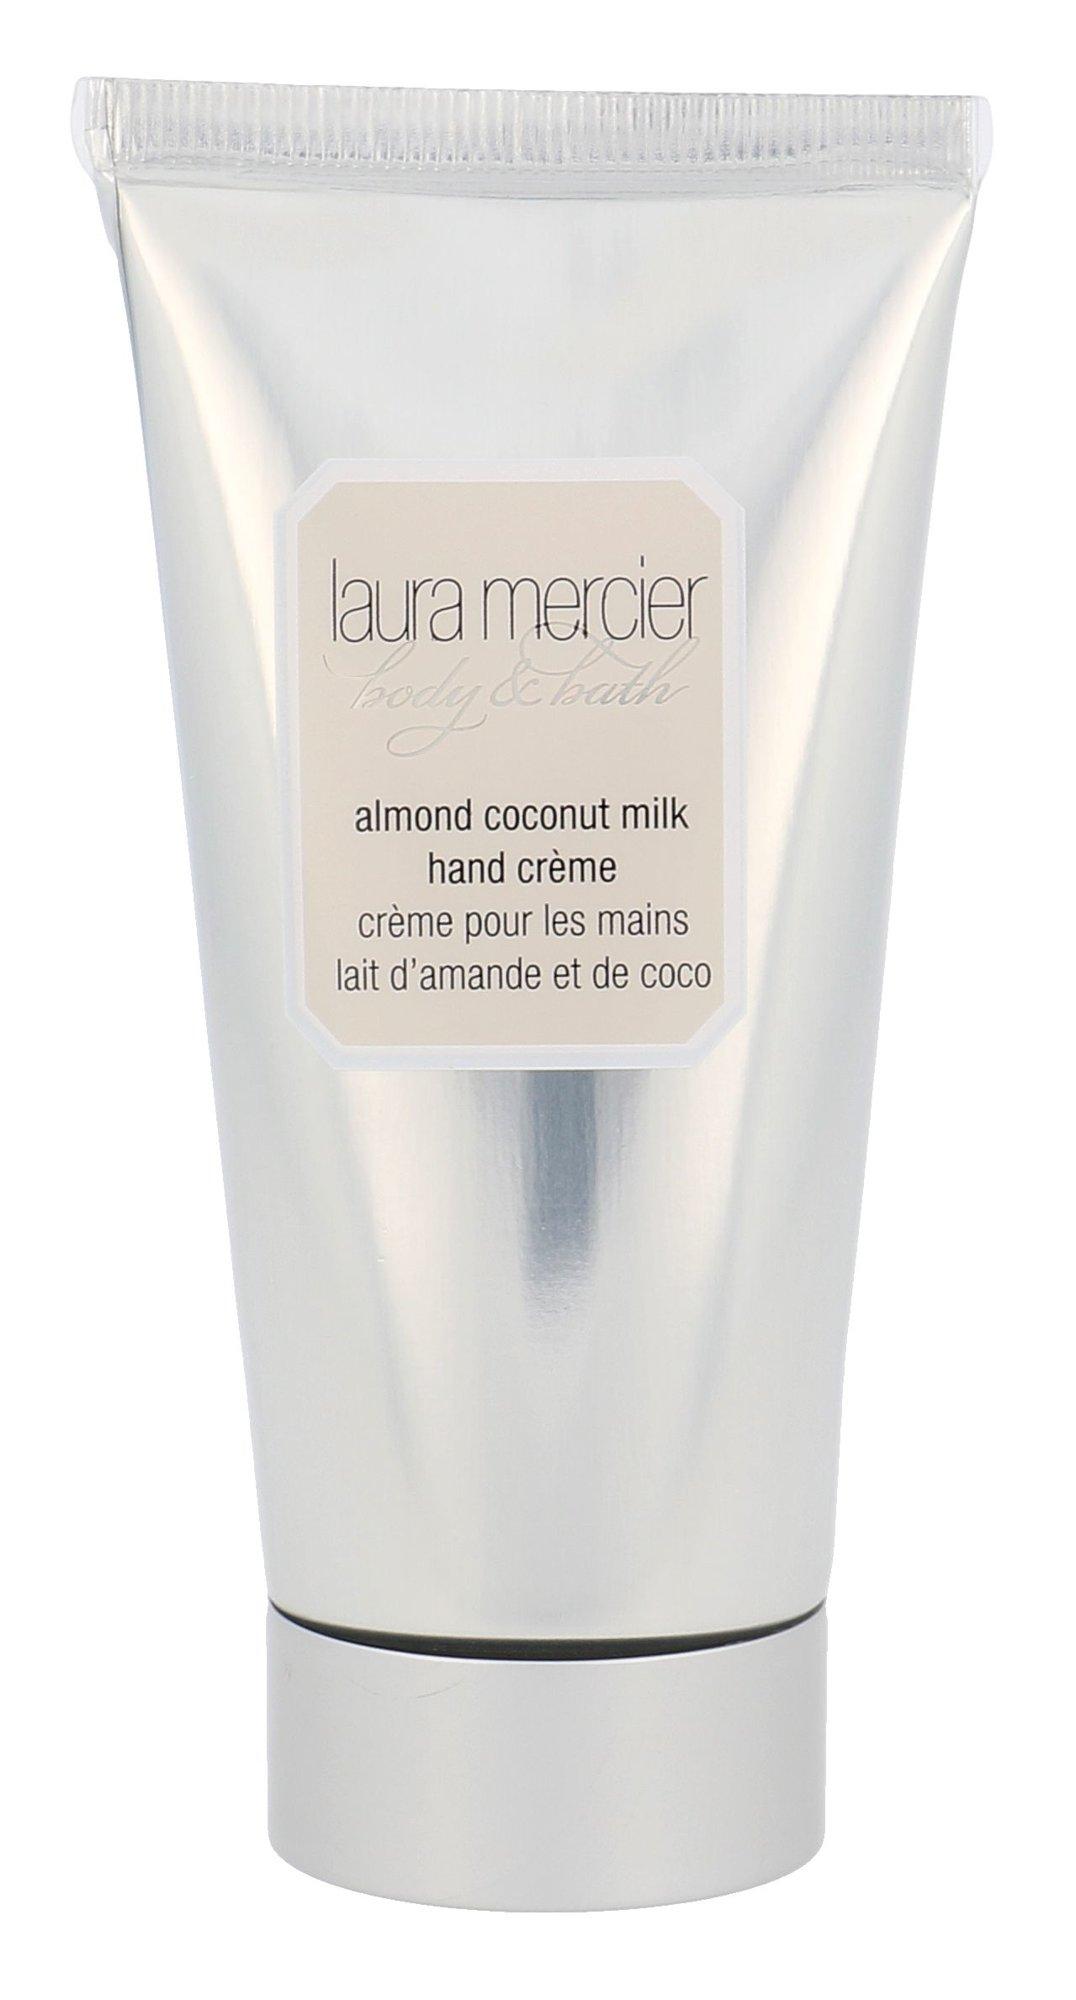 Laura Mercier Body & Bath Cosmetic 50ml  Almond Coconut Milk